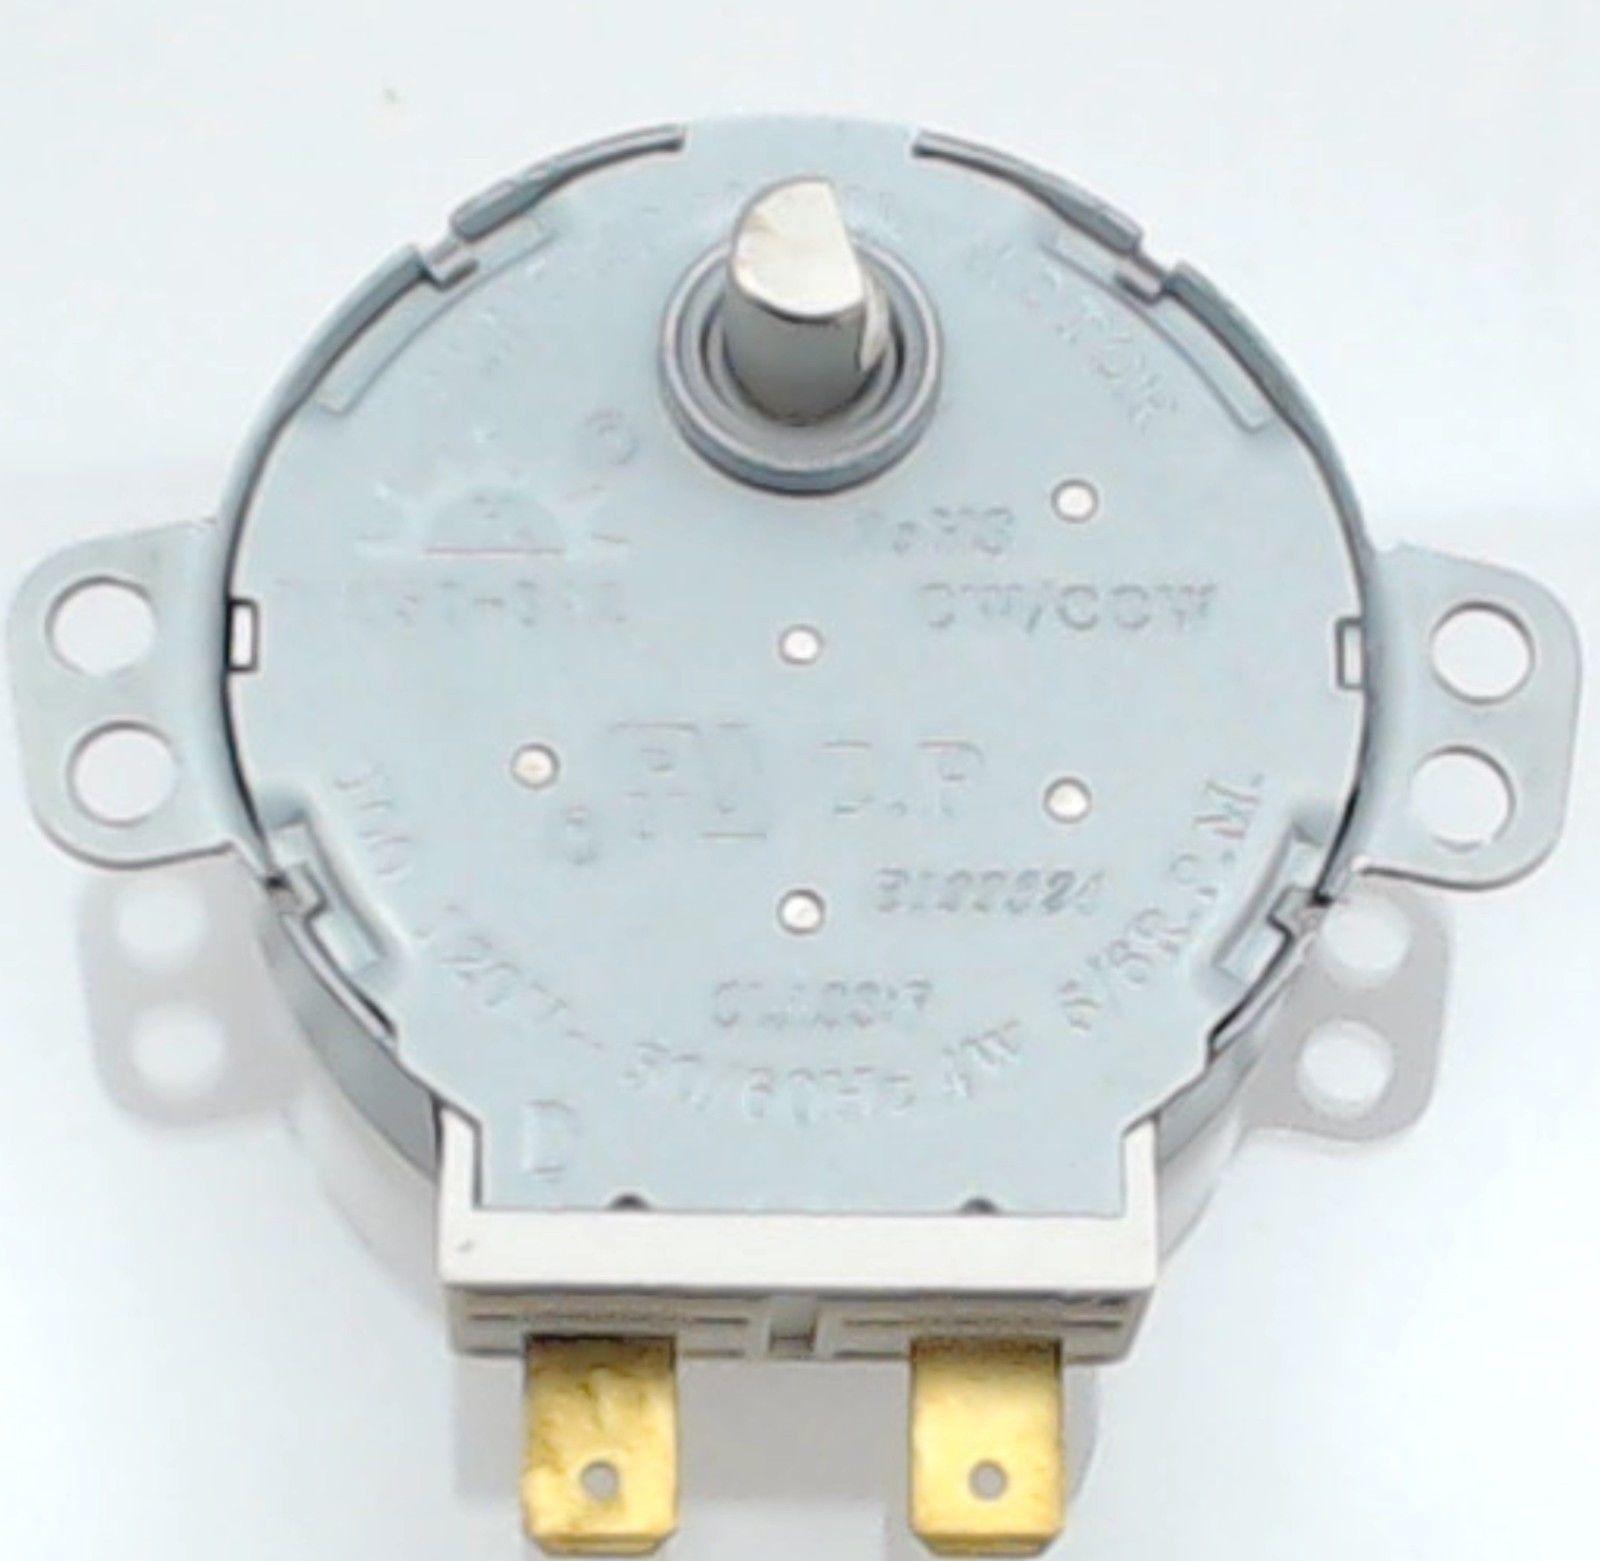 Microwave Turntable Motor For Whirlpool Sears Ap3130796 Ps391978 8183954 Ebay